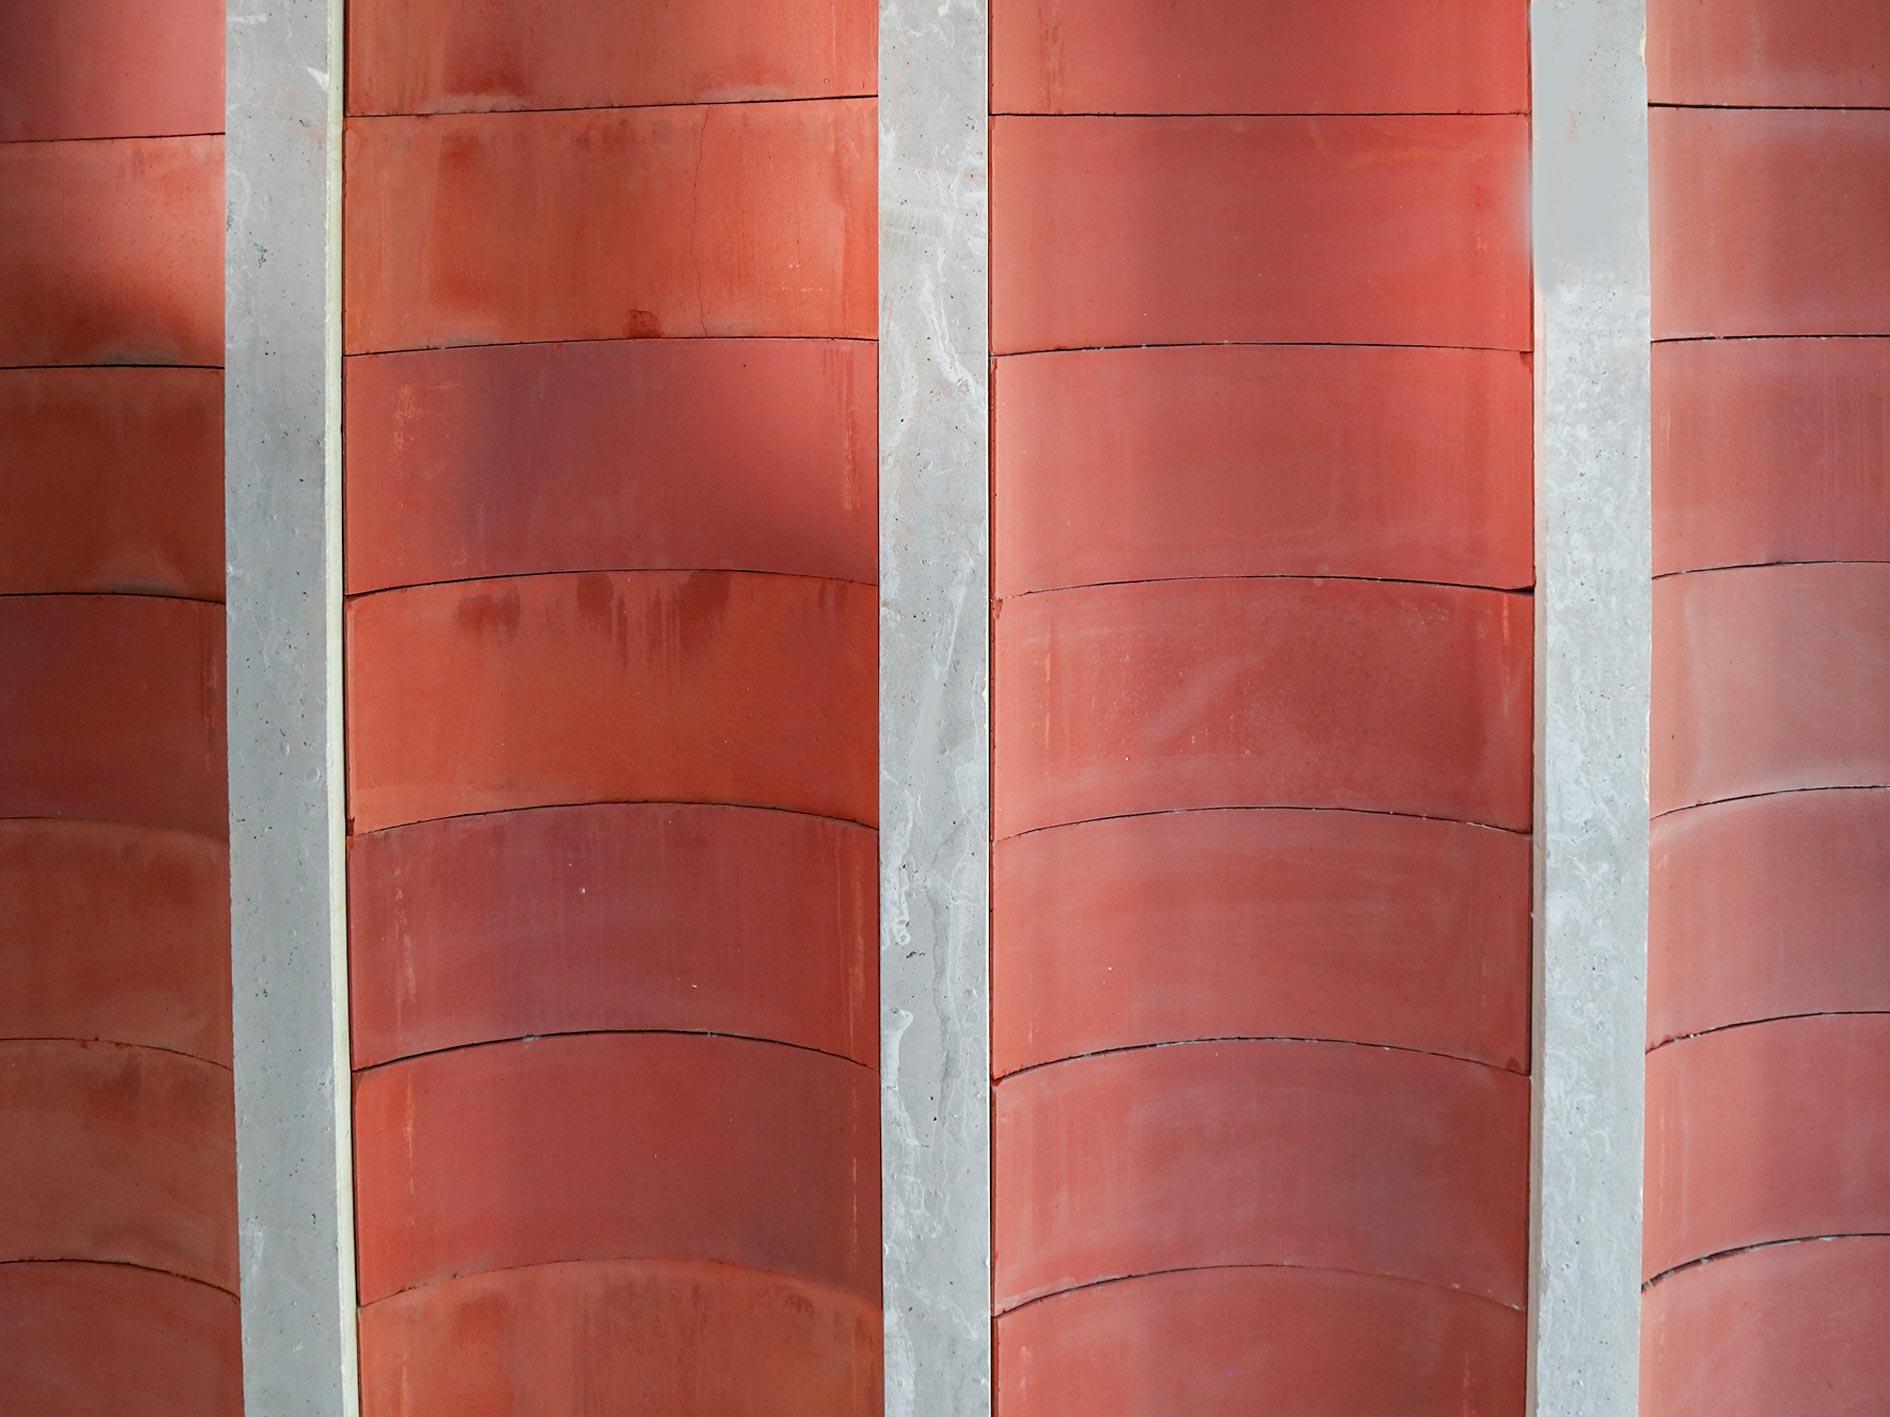 Bovedillas cerámicas curvas, arquitectura unifamiliar